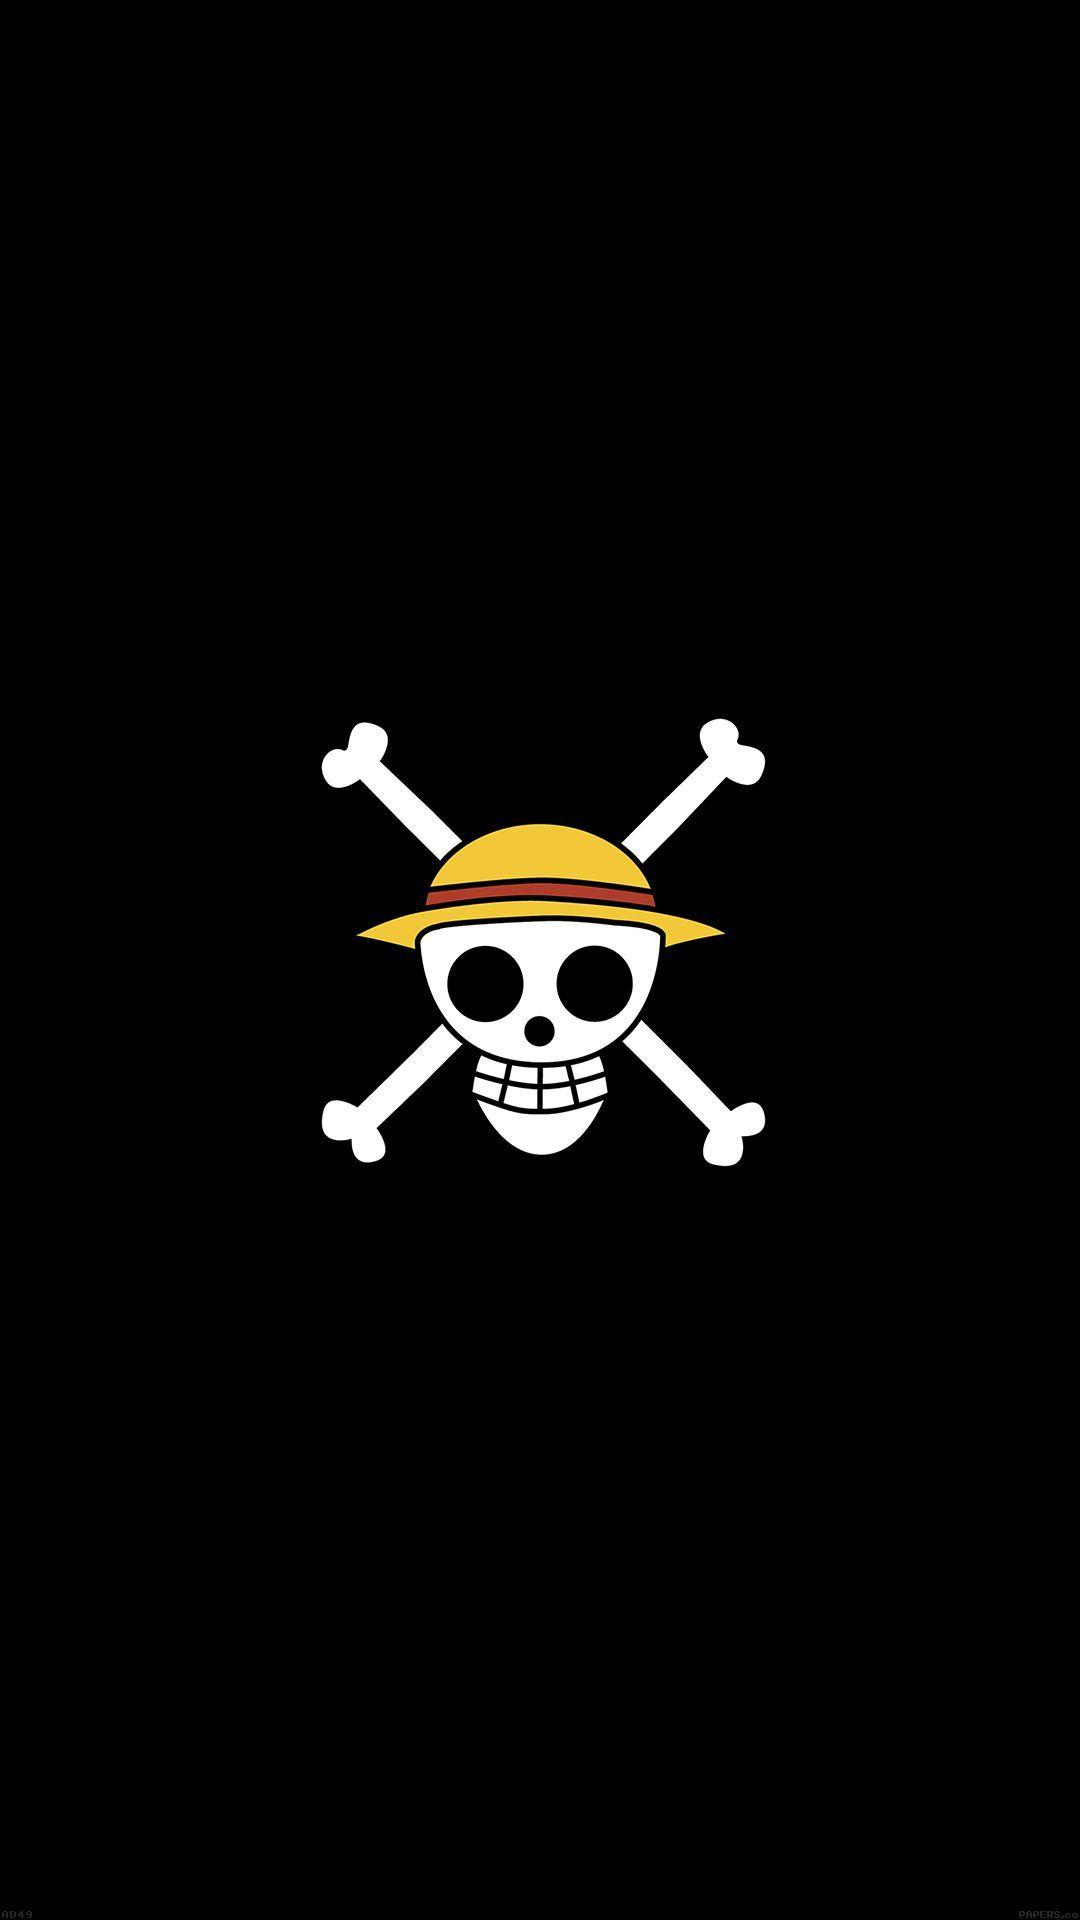 Wallpaper One Piece Iphone 6 di 2020   Seni gelap, Objek ...